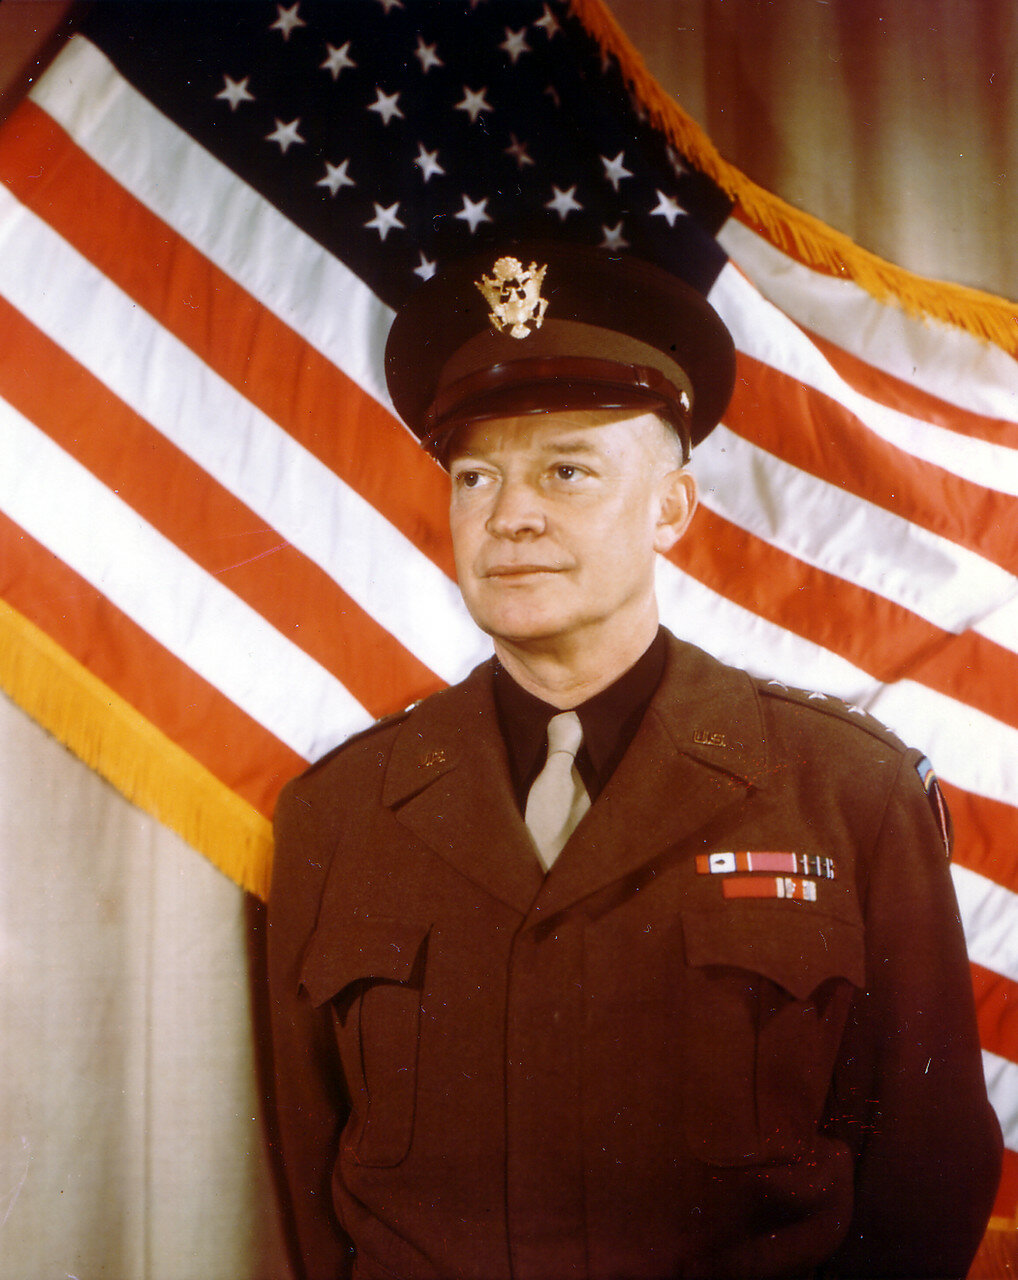 01. Генерал Дуайт Дэвид Эйзенхауэр на фоне американского флага